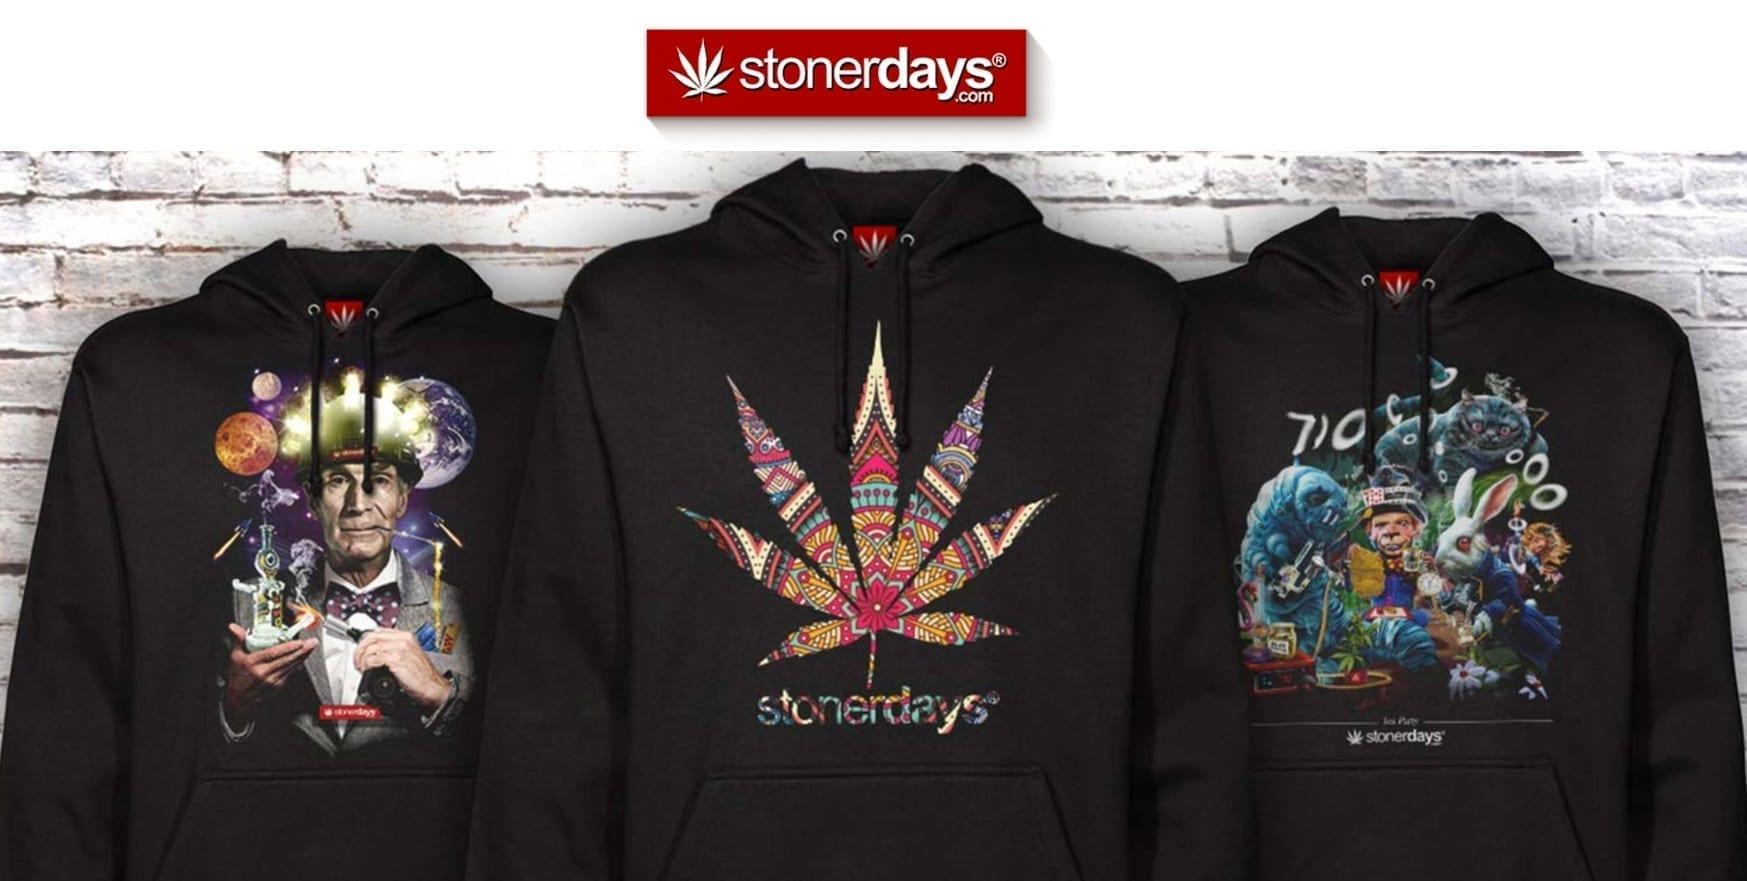 stonerdays sweaters